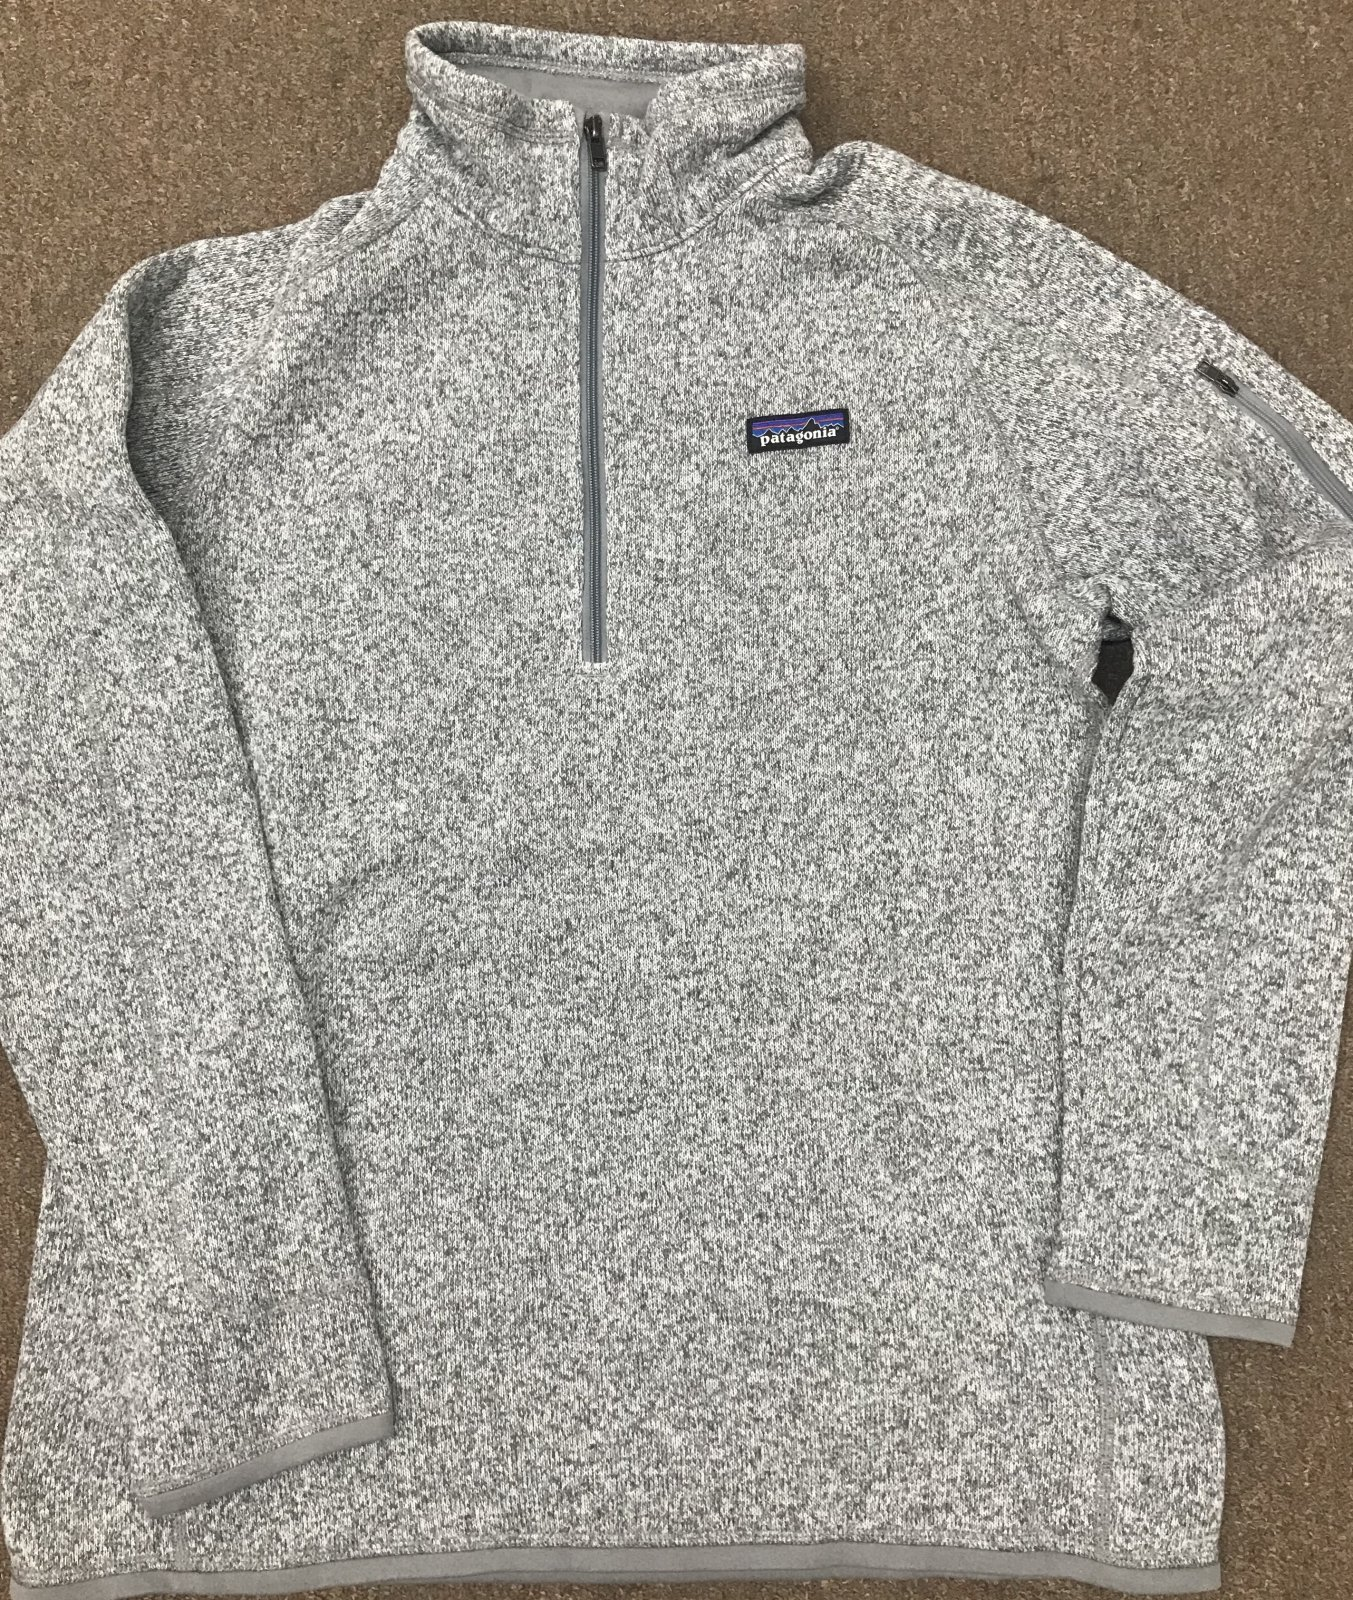 Patagonia Women's Better Sweater  LS 1/4 Zip